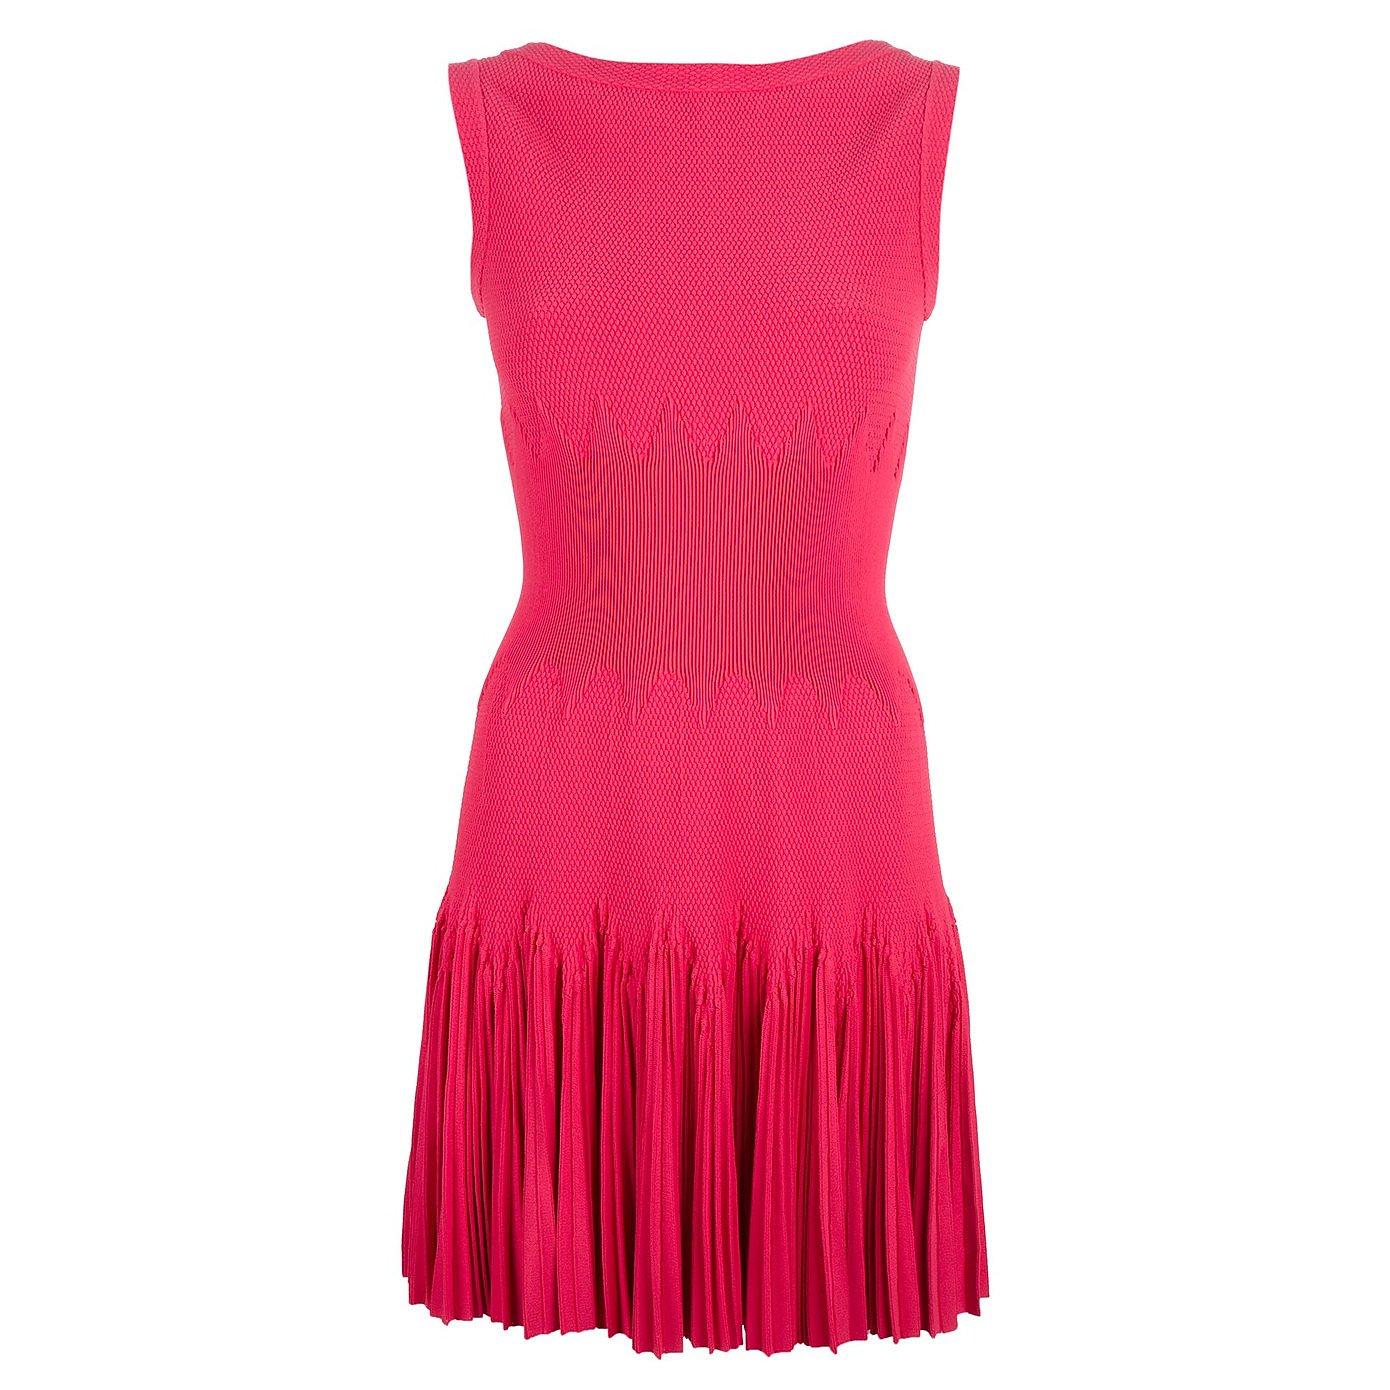 Alaïa Fitted Textured Knit Dress